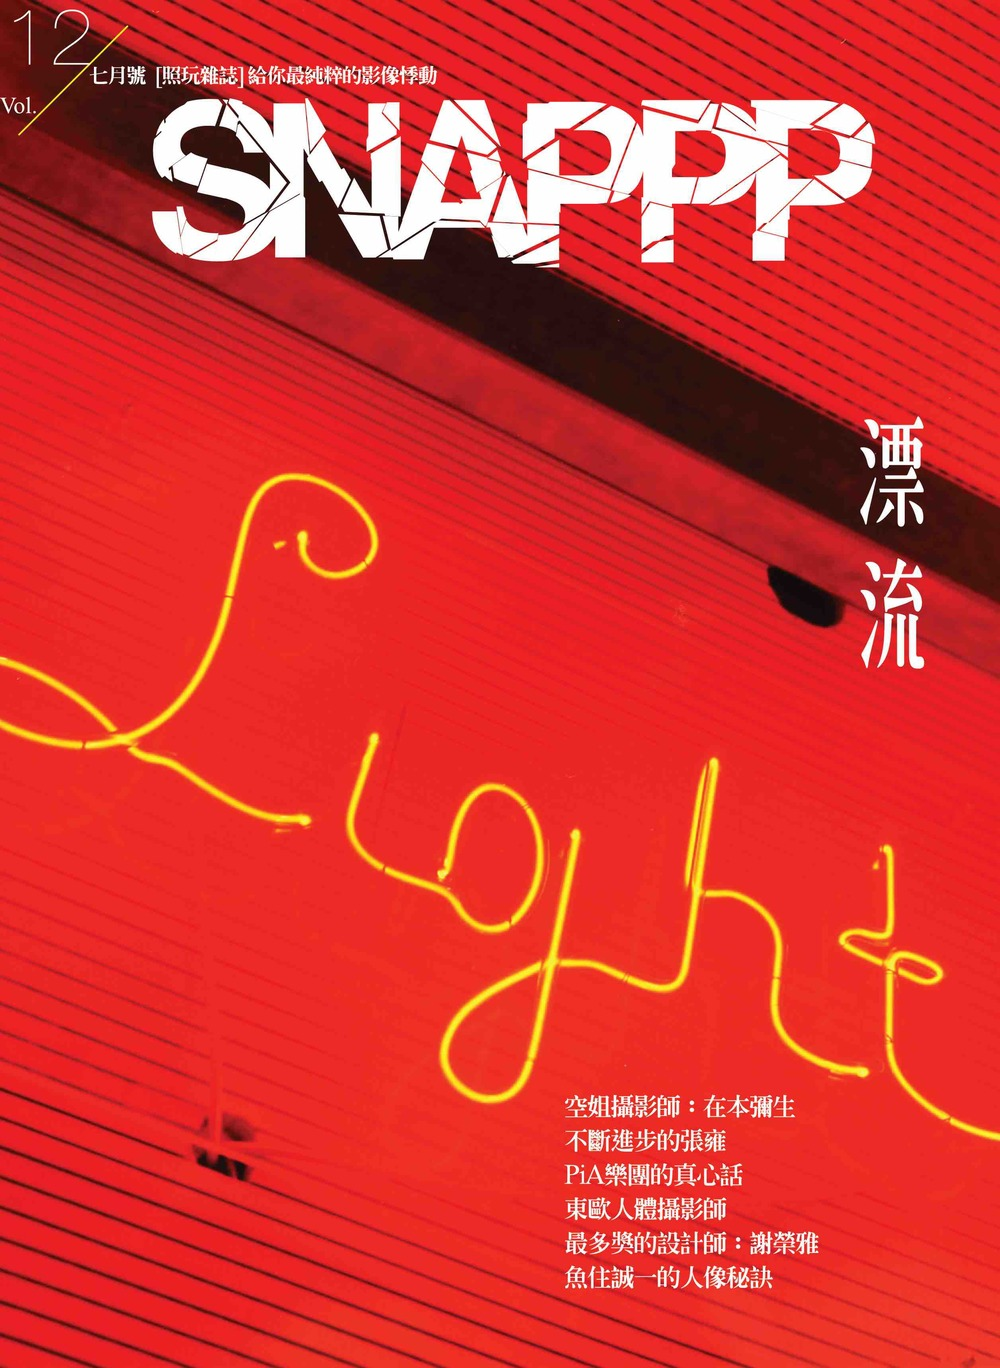 SNAPPP-NO12-ver1.jpg